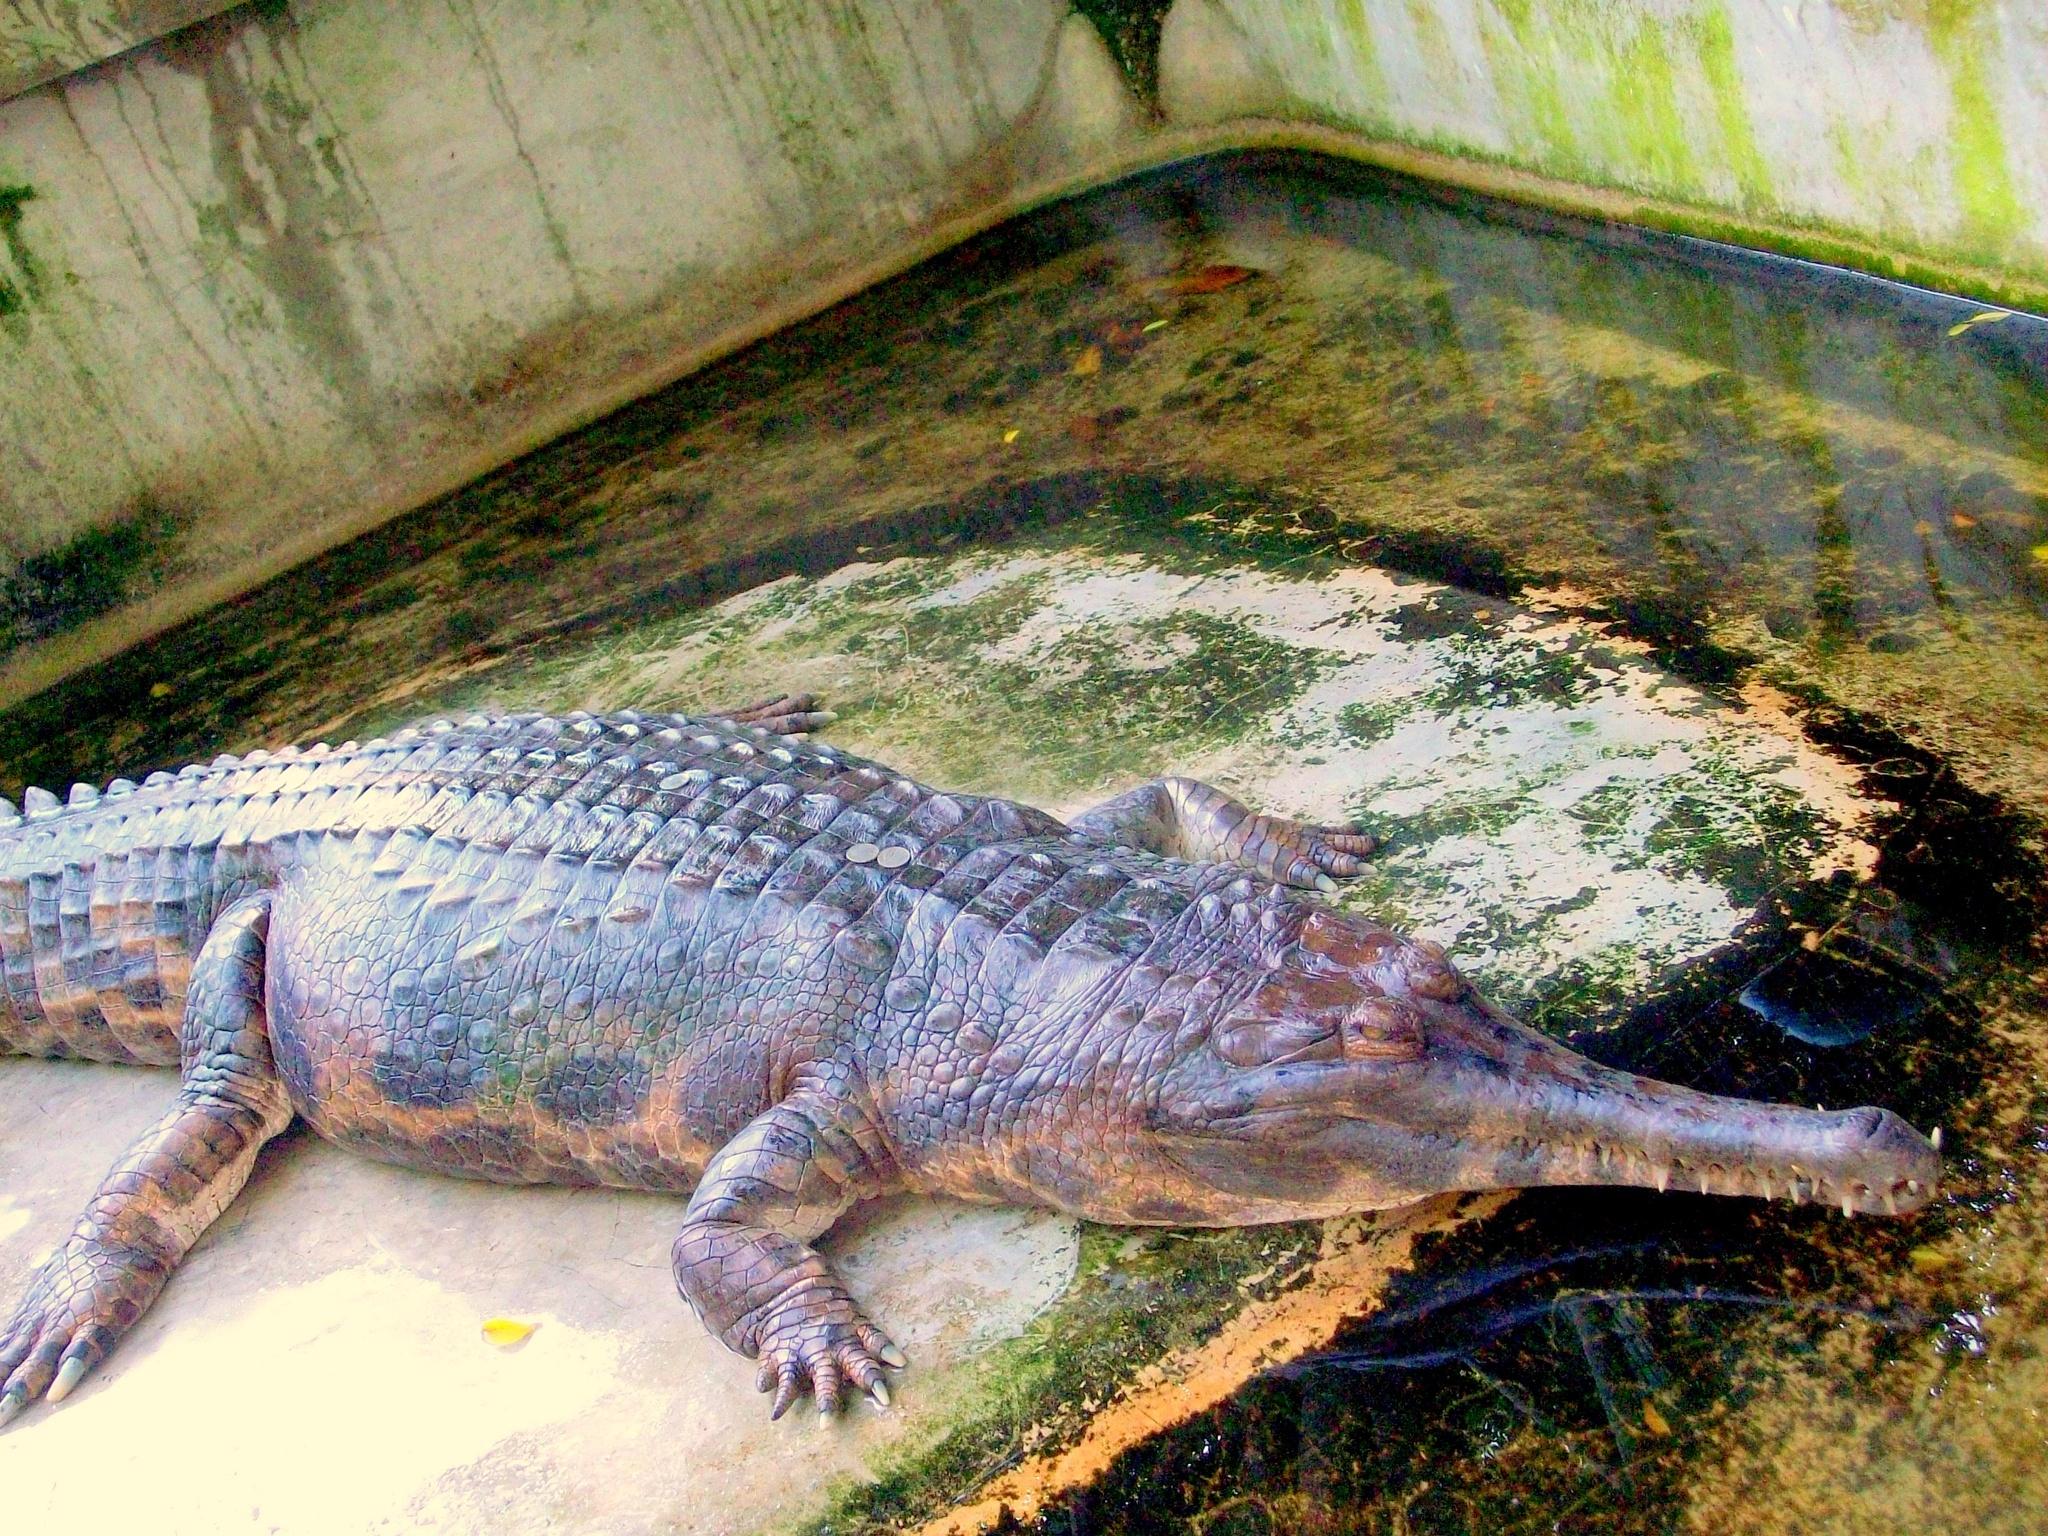 The Million Years Stone Park & Pattaya Crocodile Farm on December 30, 2015 by NatalyaParris